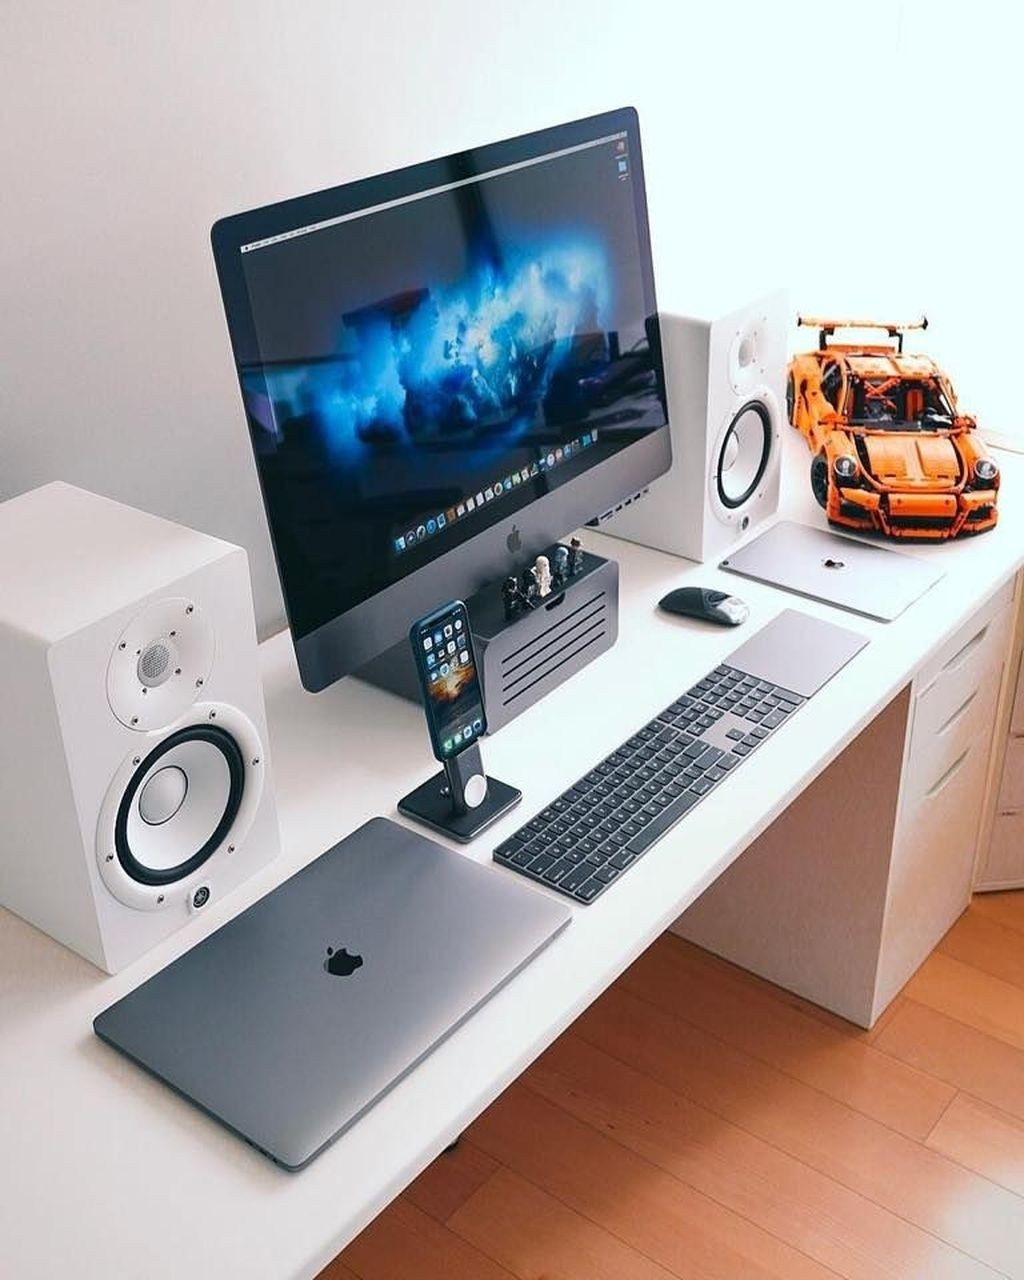 20 Unique Gaming Desk Computer Setup Ideas With Images Computer Desk Setup Diy Computer Desk Computer Setup